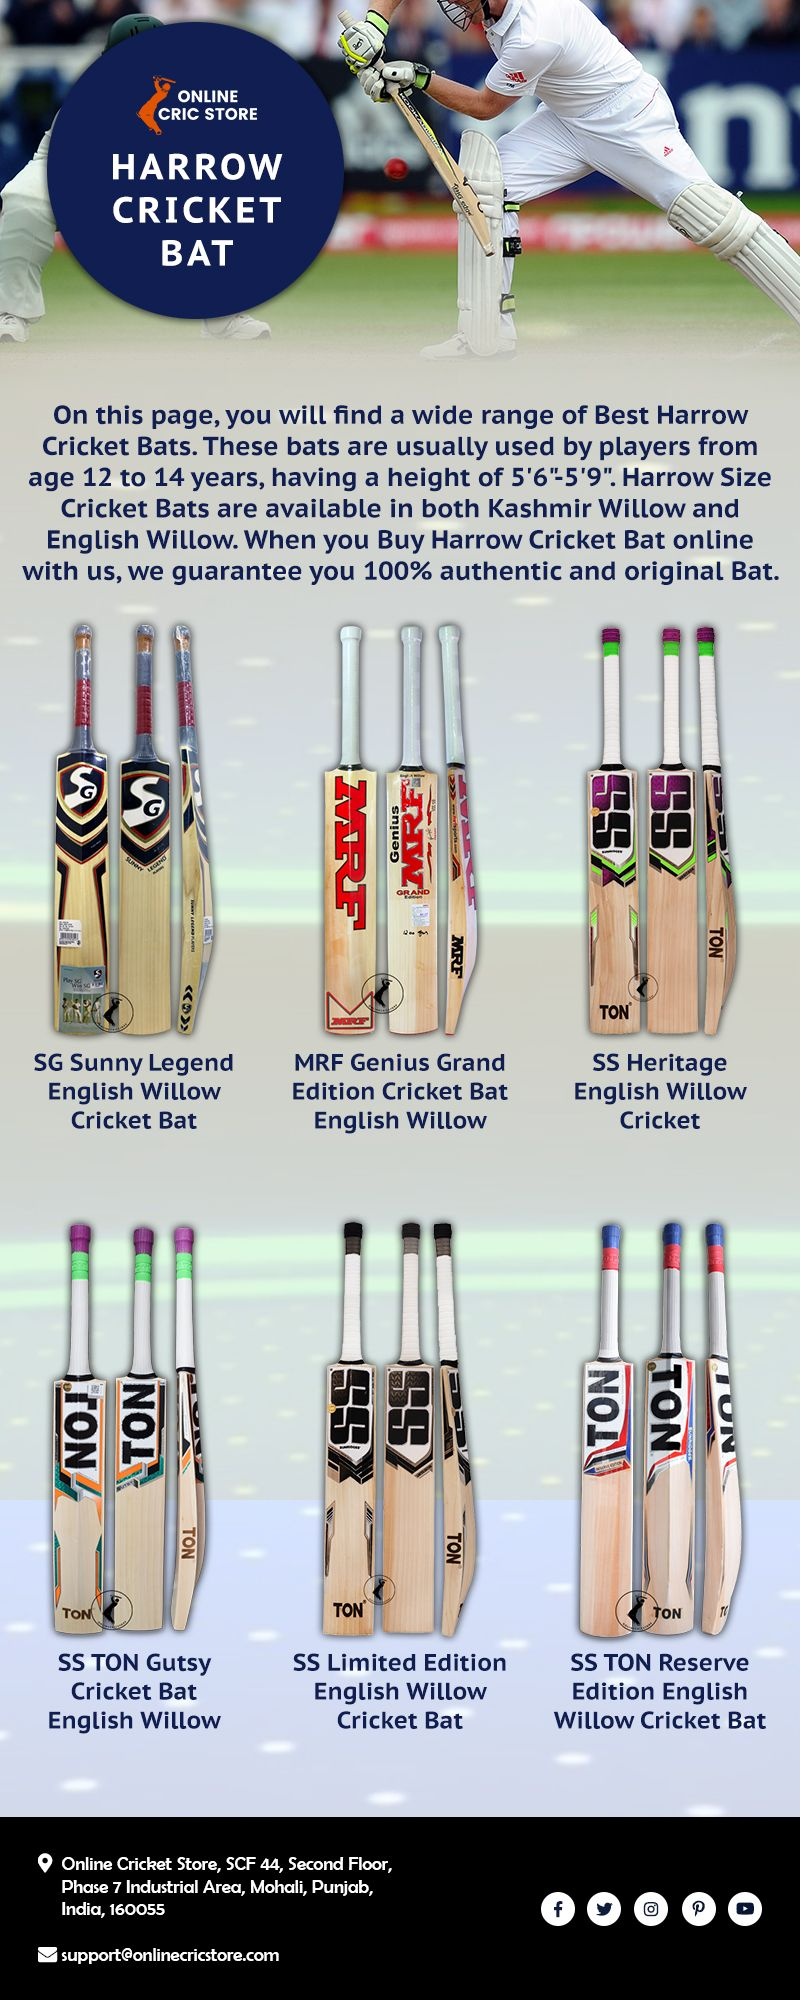 Harrow Size Bat Harrow Cricket Bats Online Cric Store Cricket Bat Bat Online Harrow